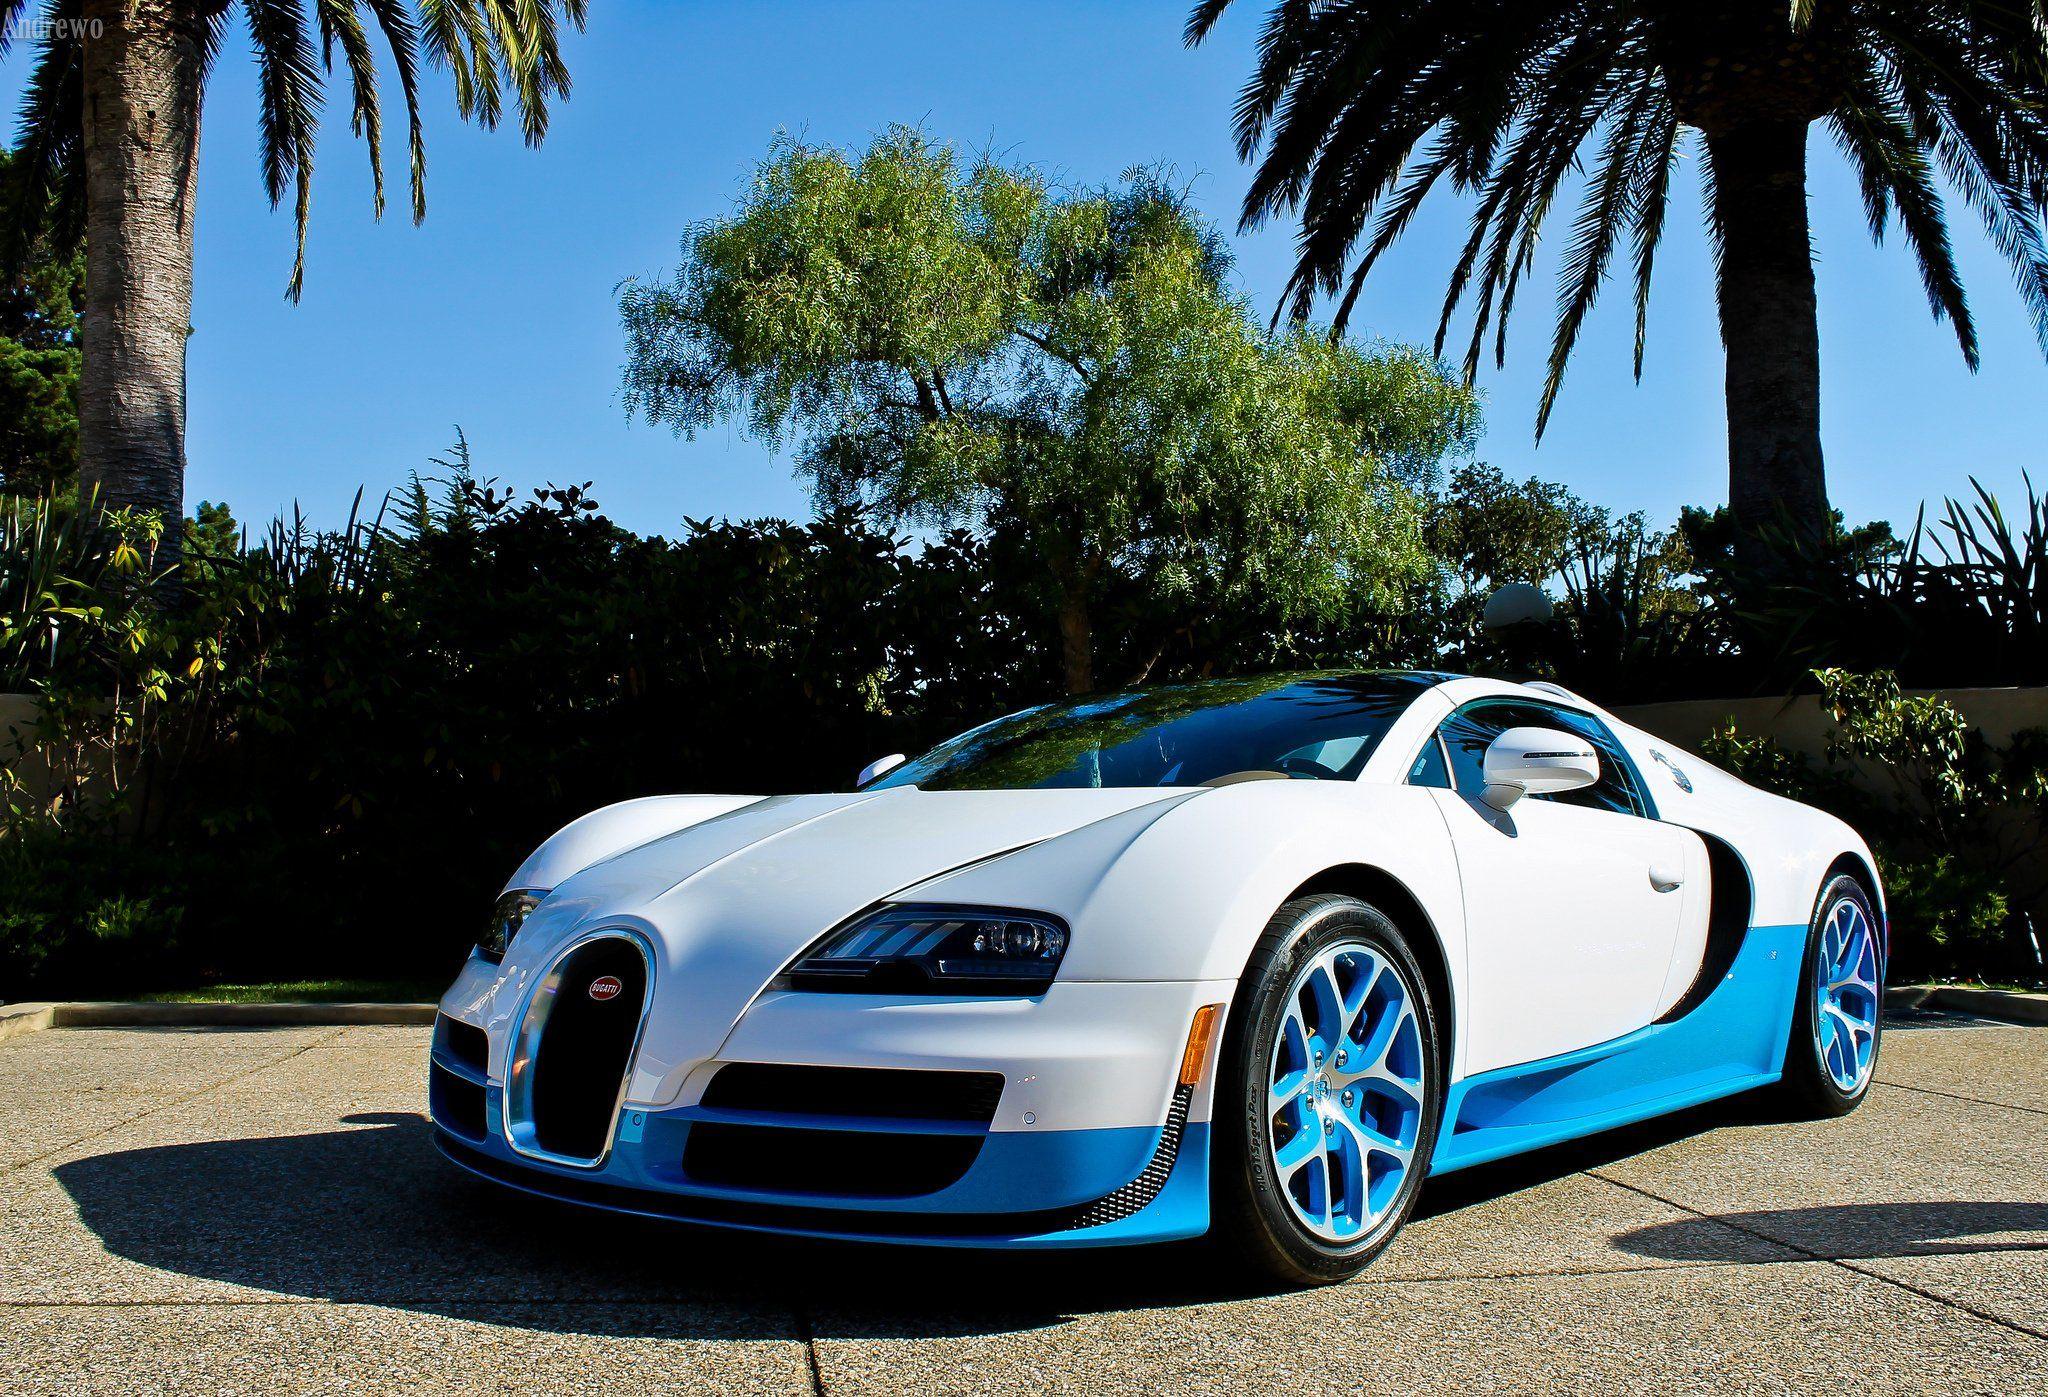 White Blue Bugatti Veyron Bugatti Veyron Vitesse Bugatti Veyron Bugatti